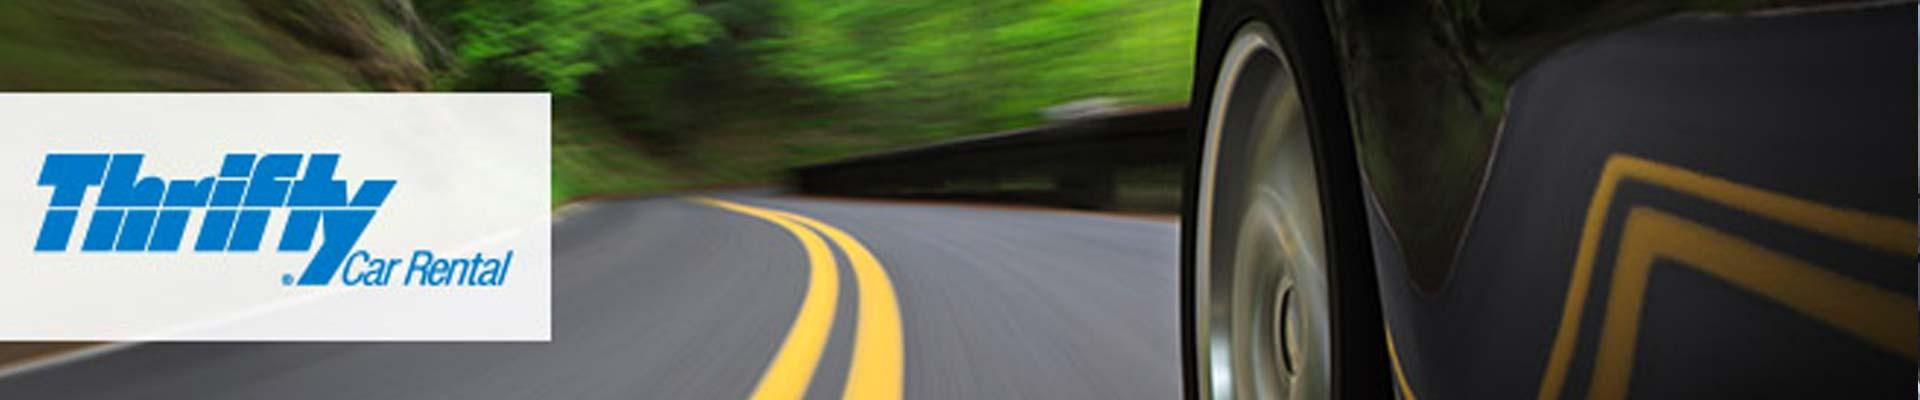 Hyannis Thrifty Car Rental Hy-Line Thrifty